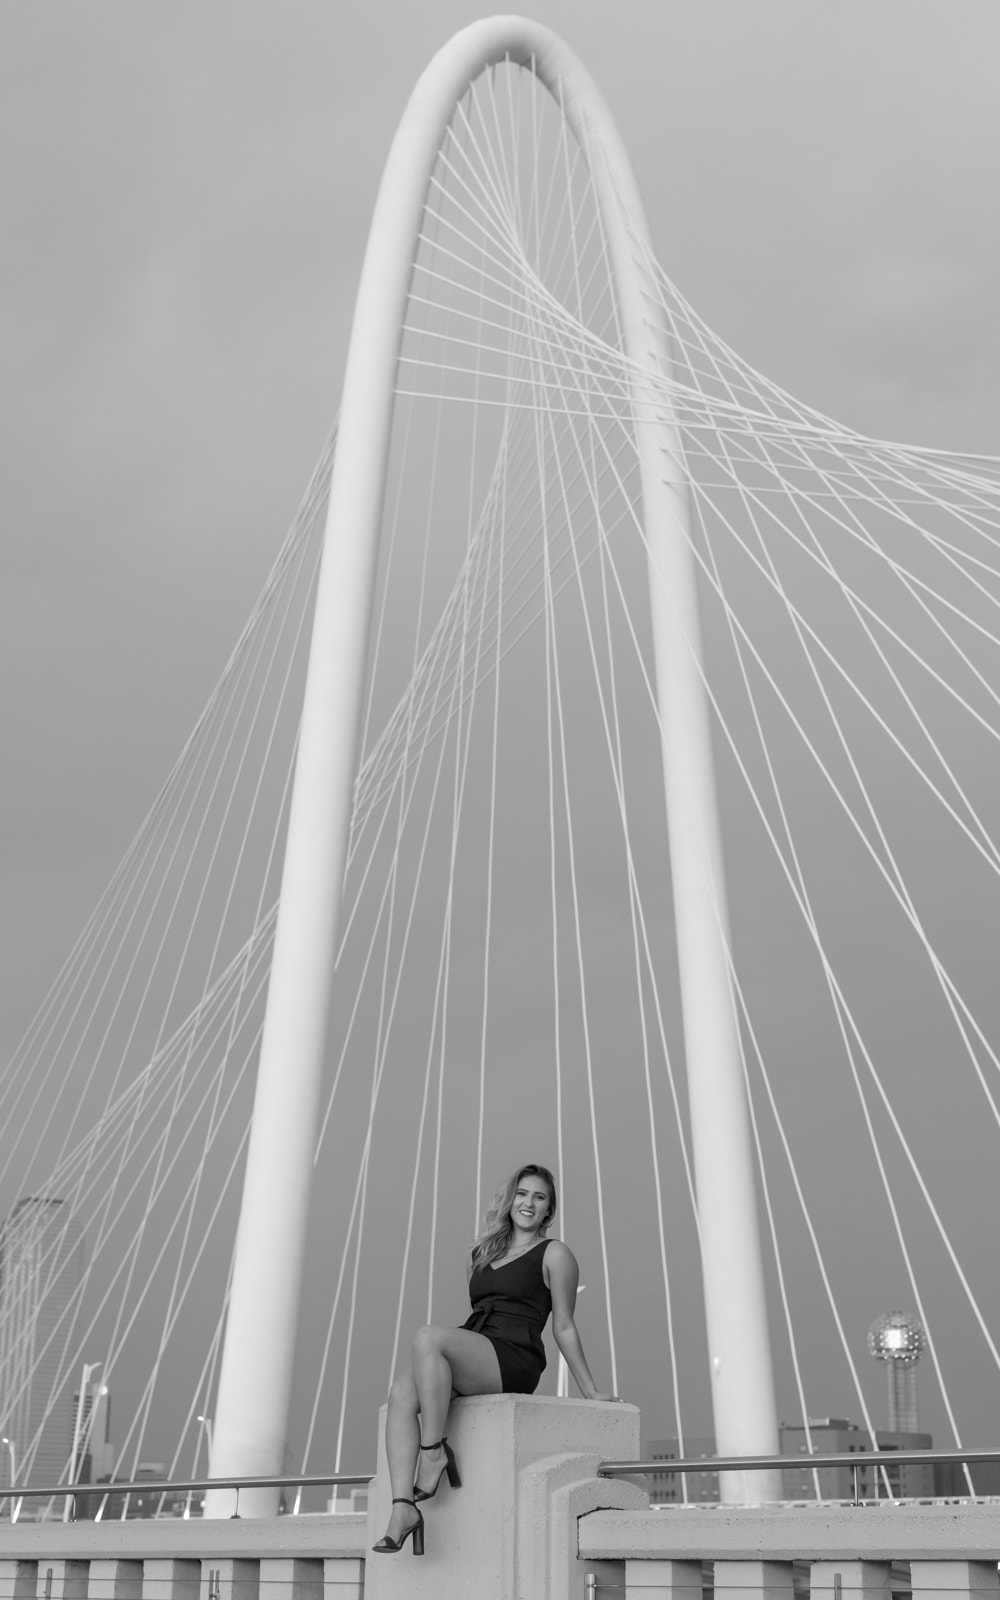 Taylor Bickford at the Margaret Hunt Hill Bridge